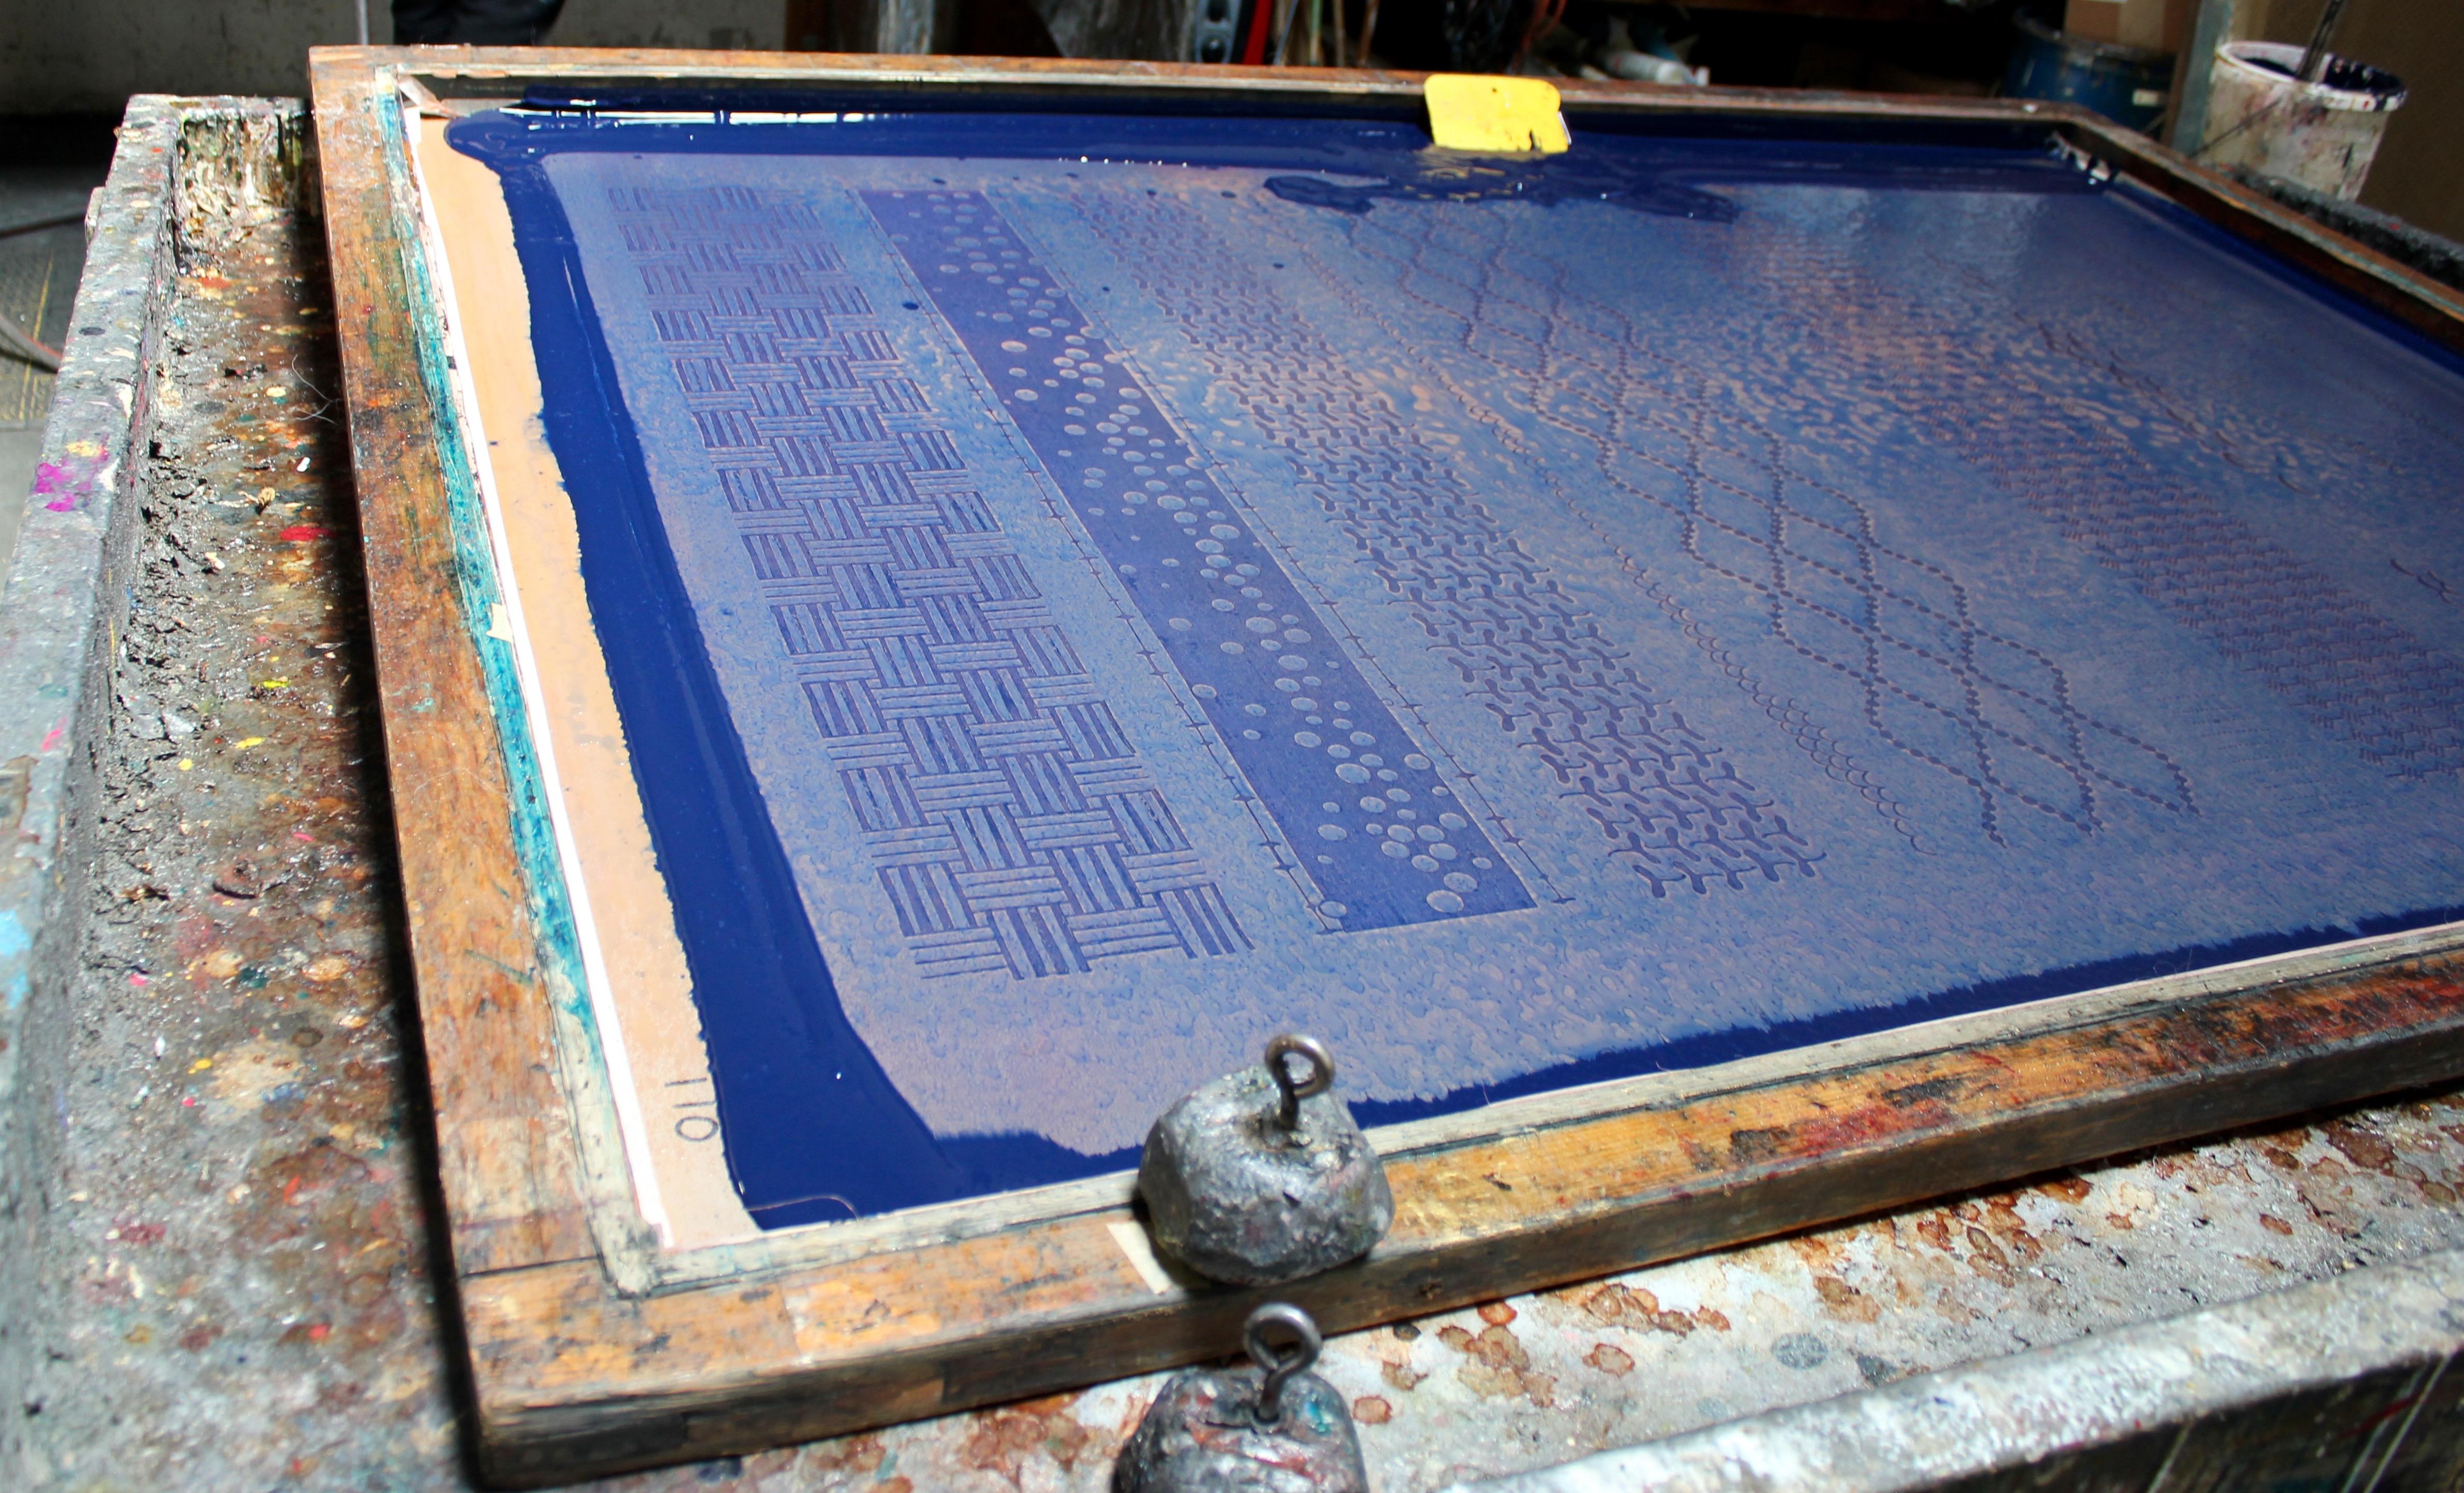 Artist Residency/Textile Design in San Francisco